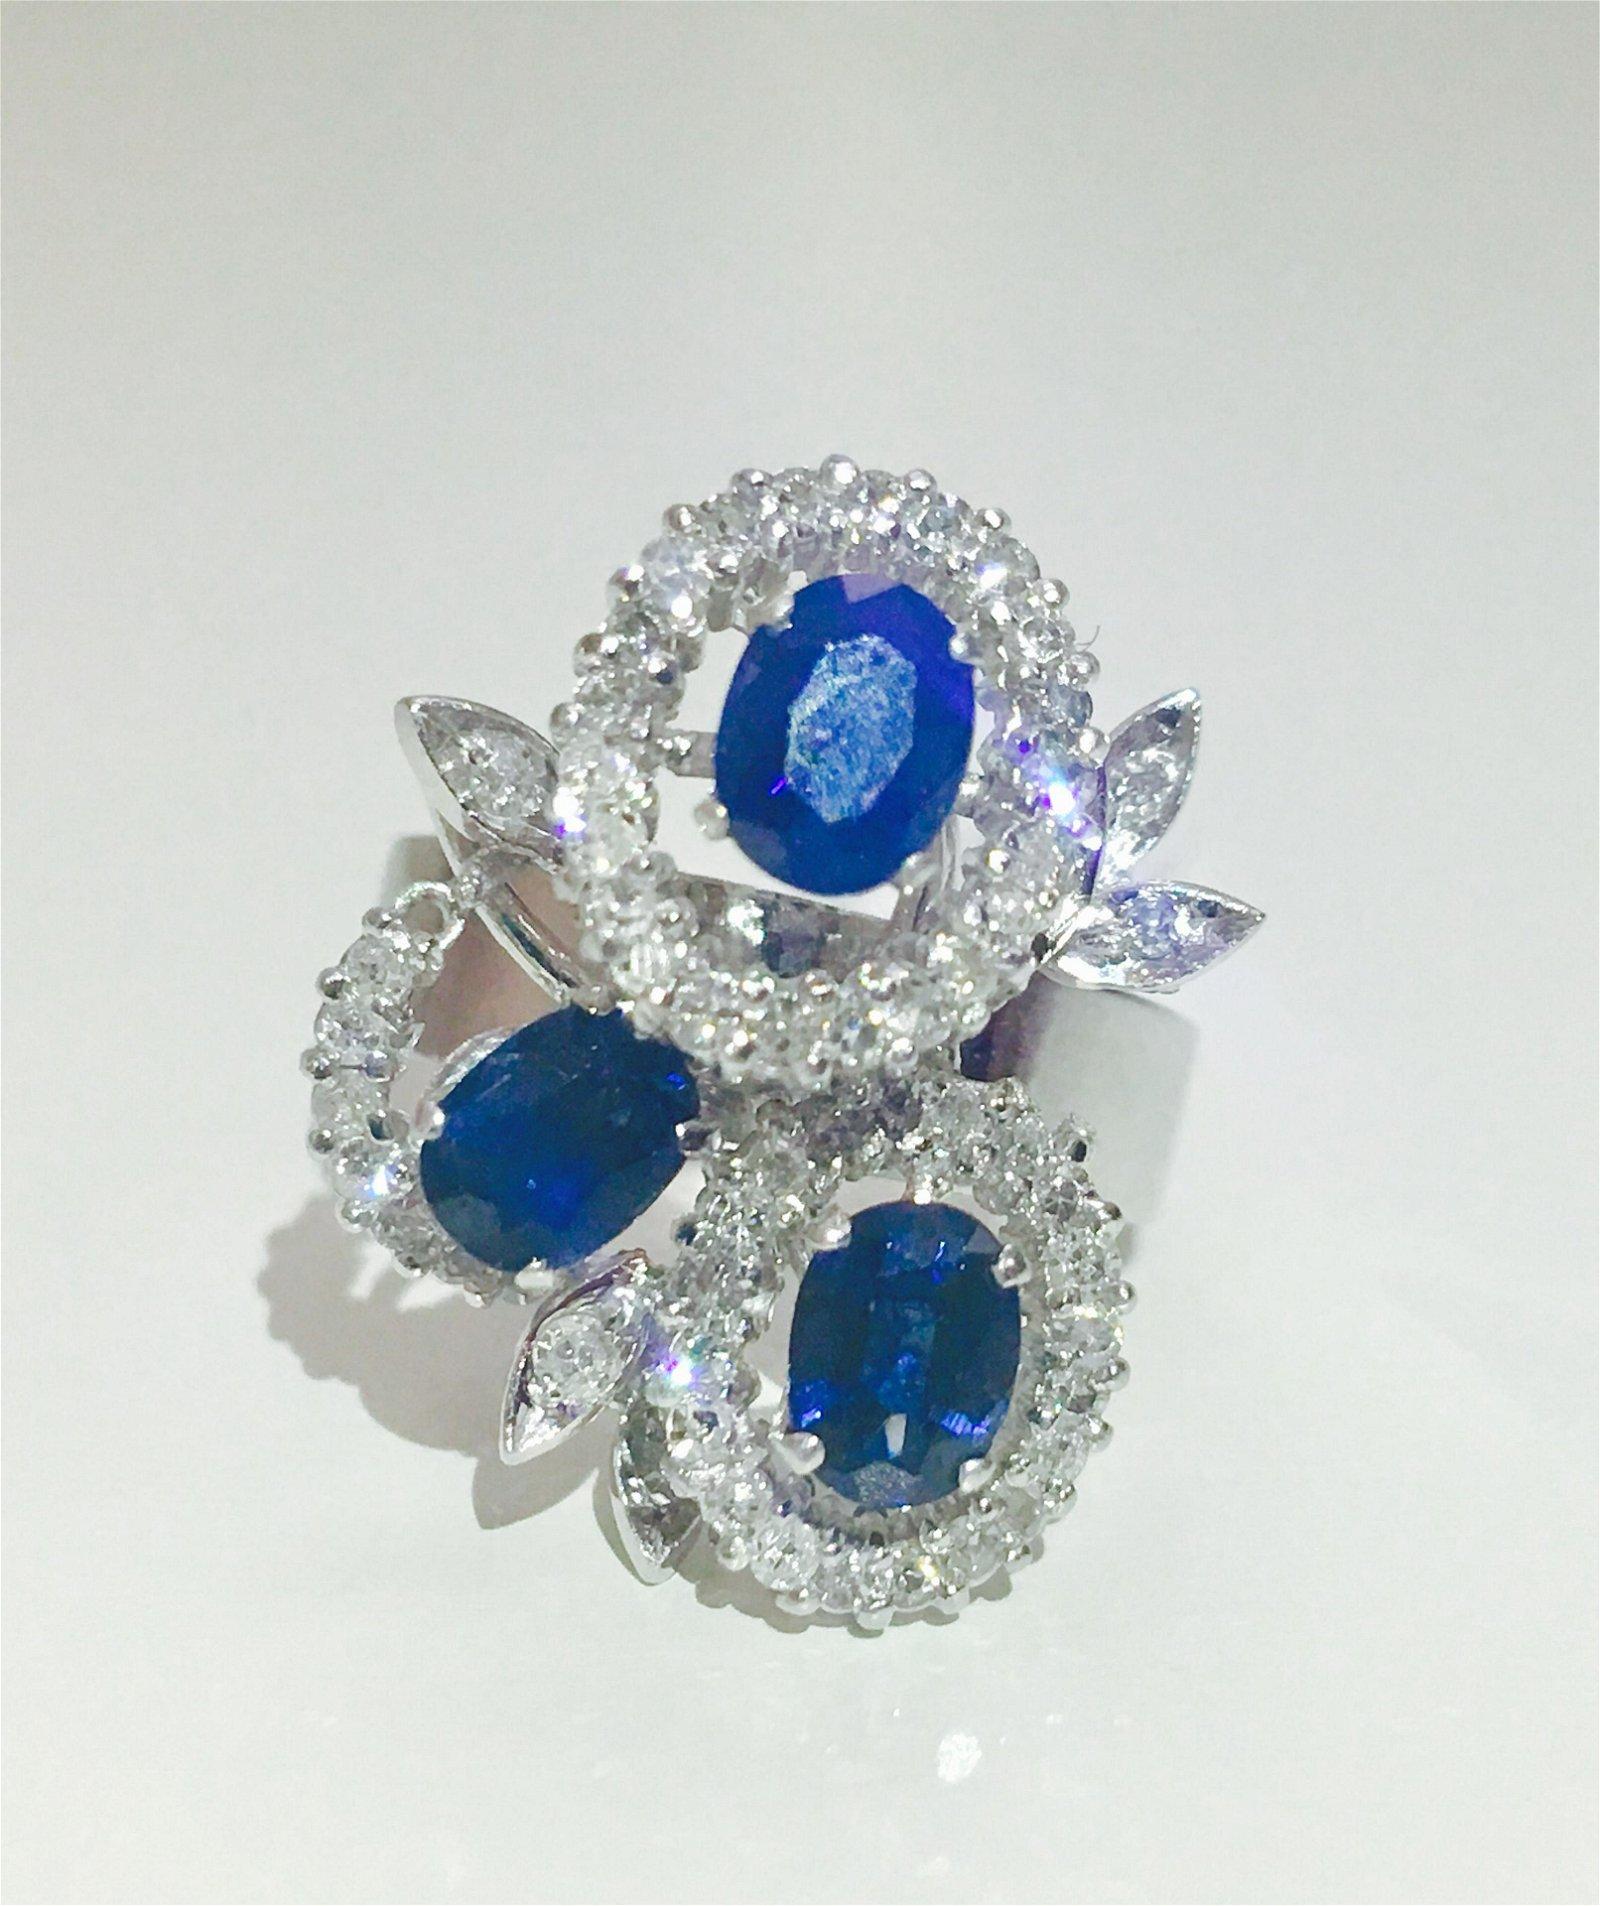 18K White gold. 3.00 CT Diamond & Blue Sapphire Ring